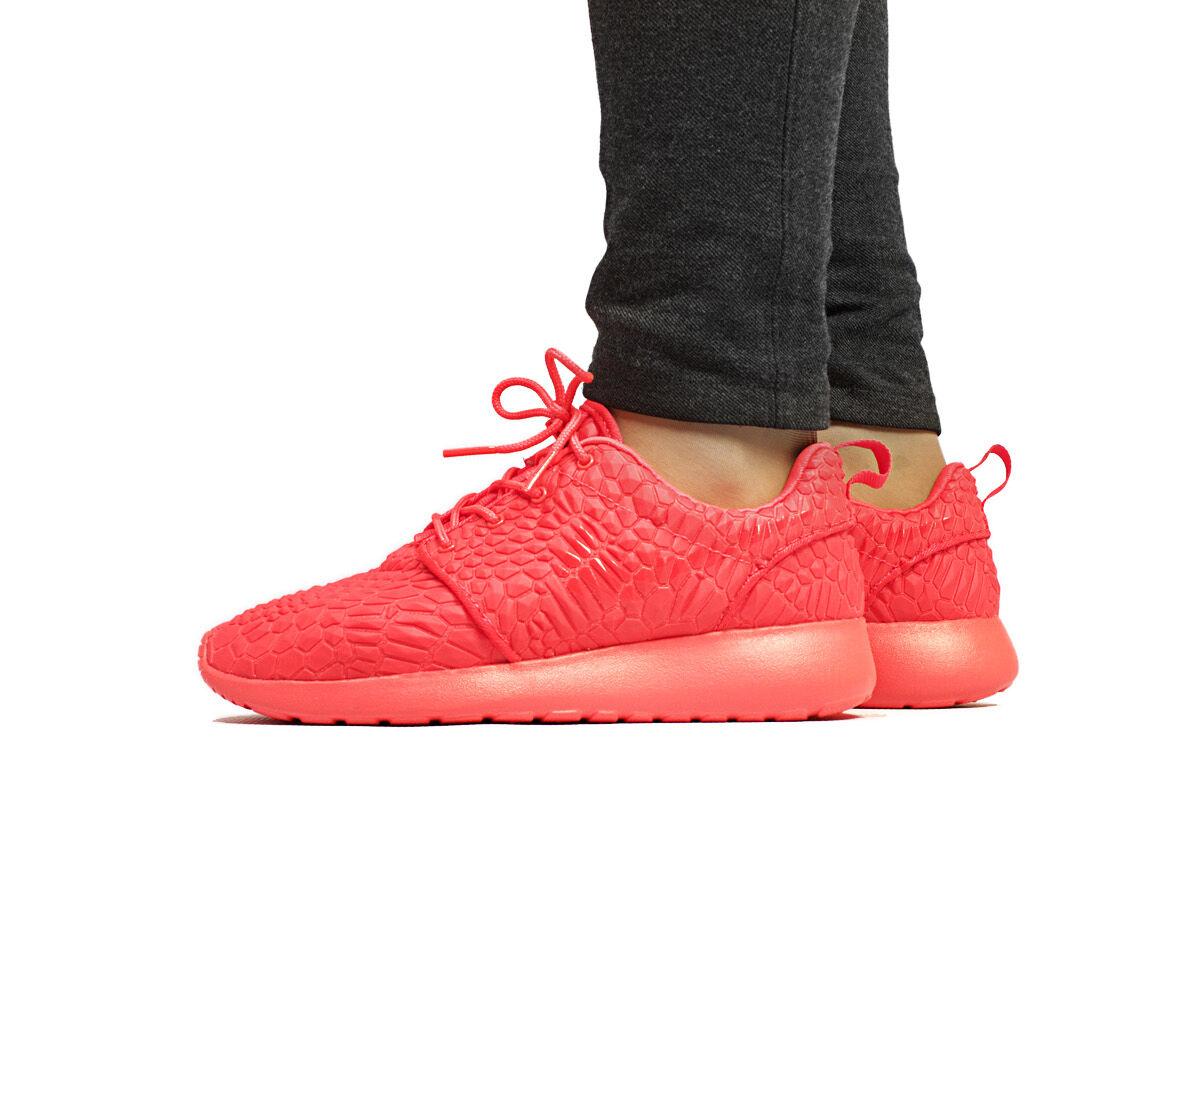 Nike Roshe One LTD DMB Bright Crimson Diamondback LTD One 807460-600 Red Rare dc83bb